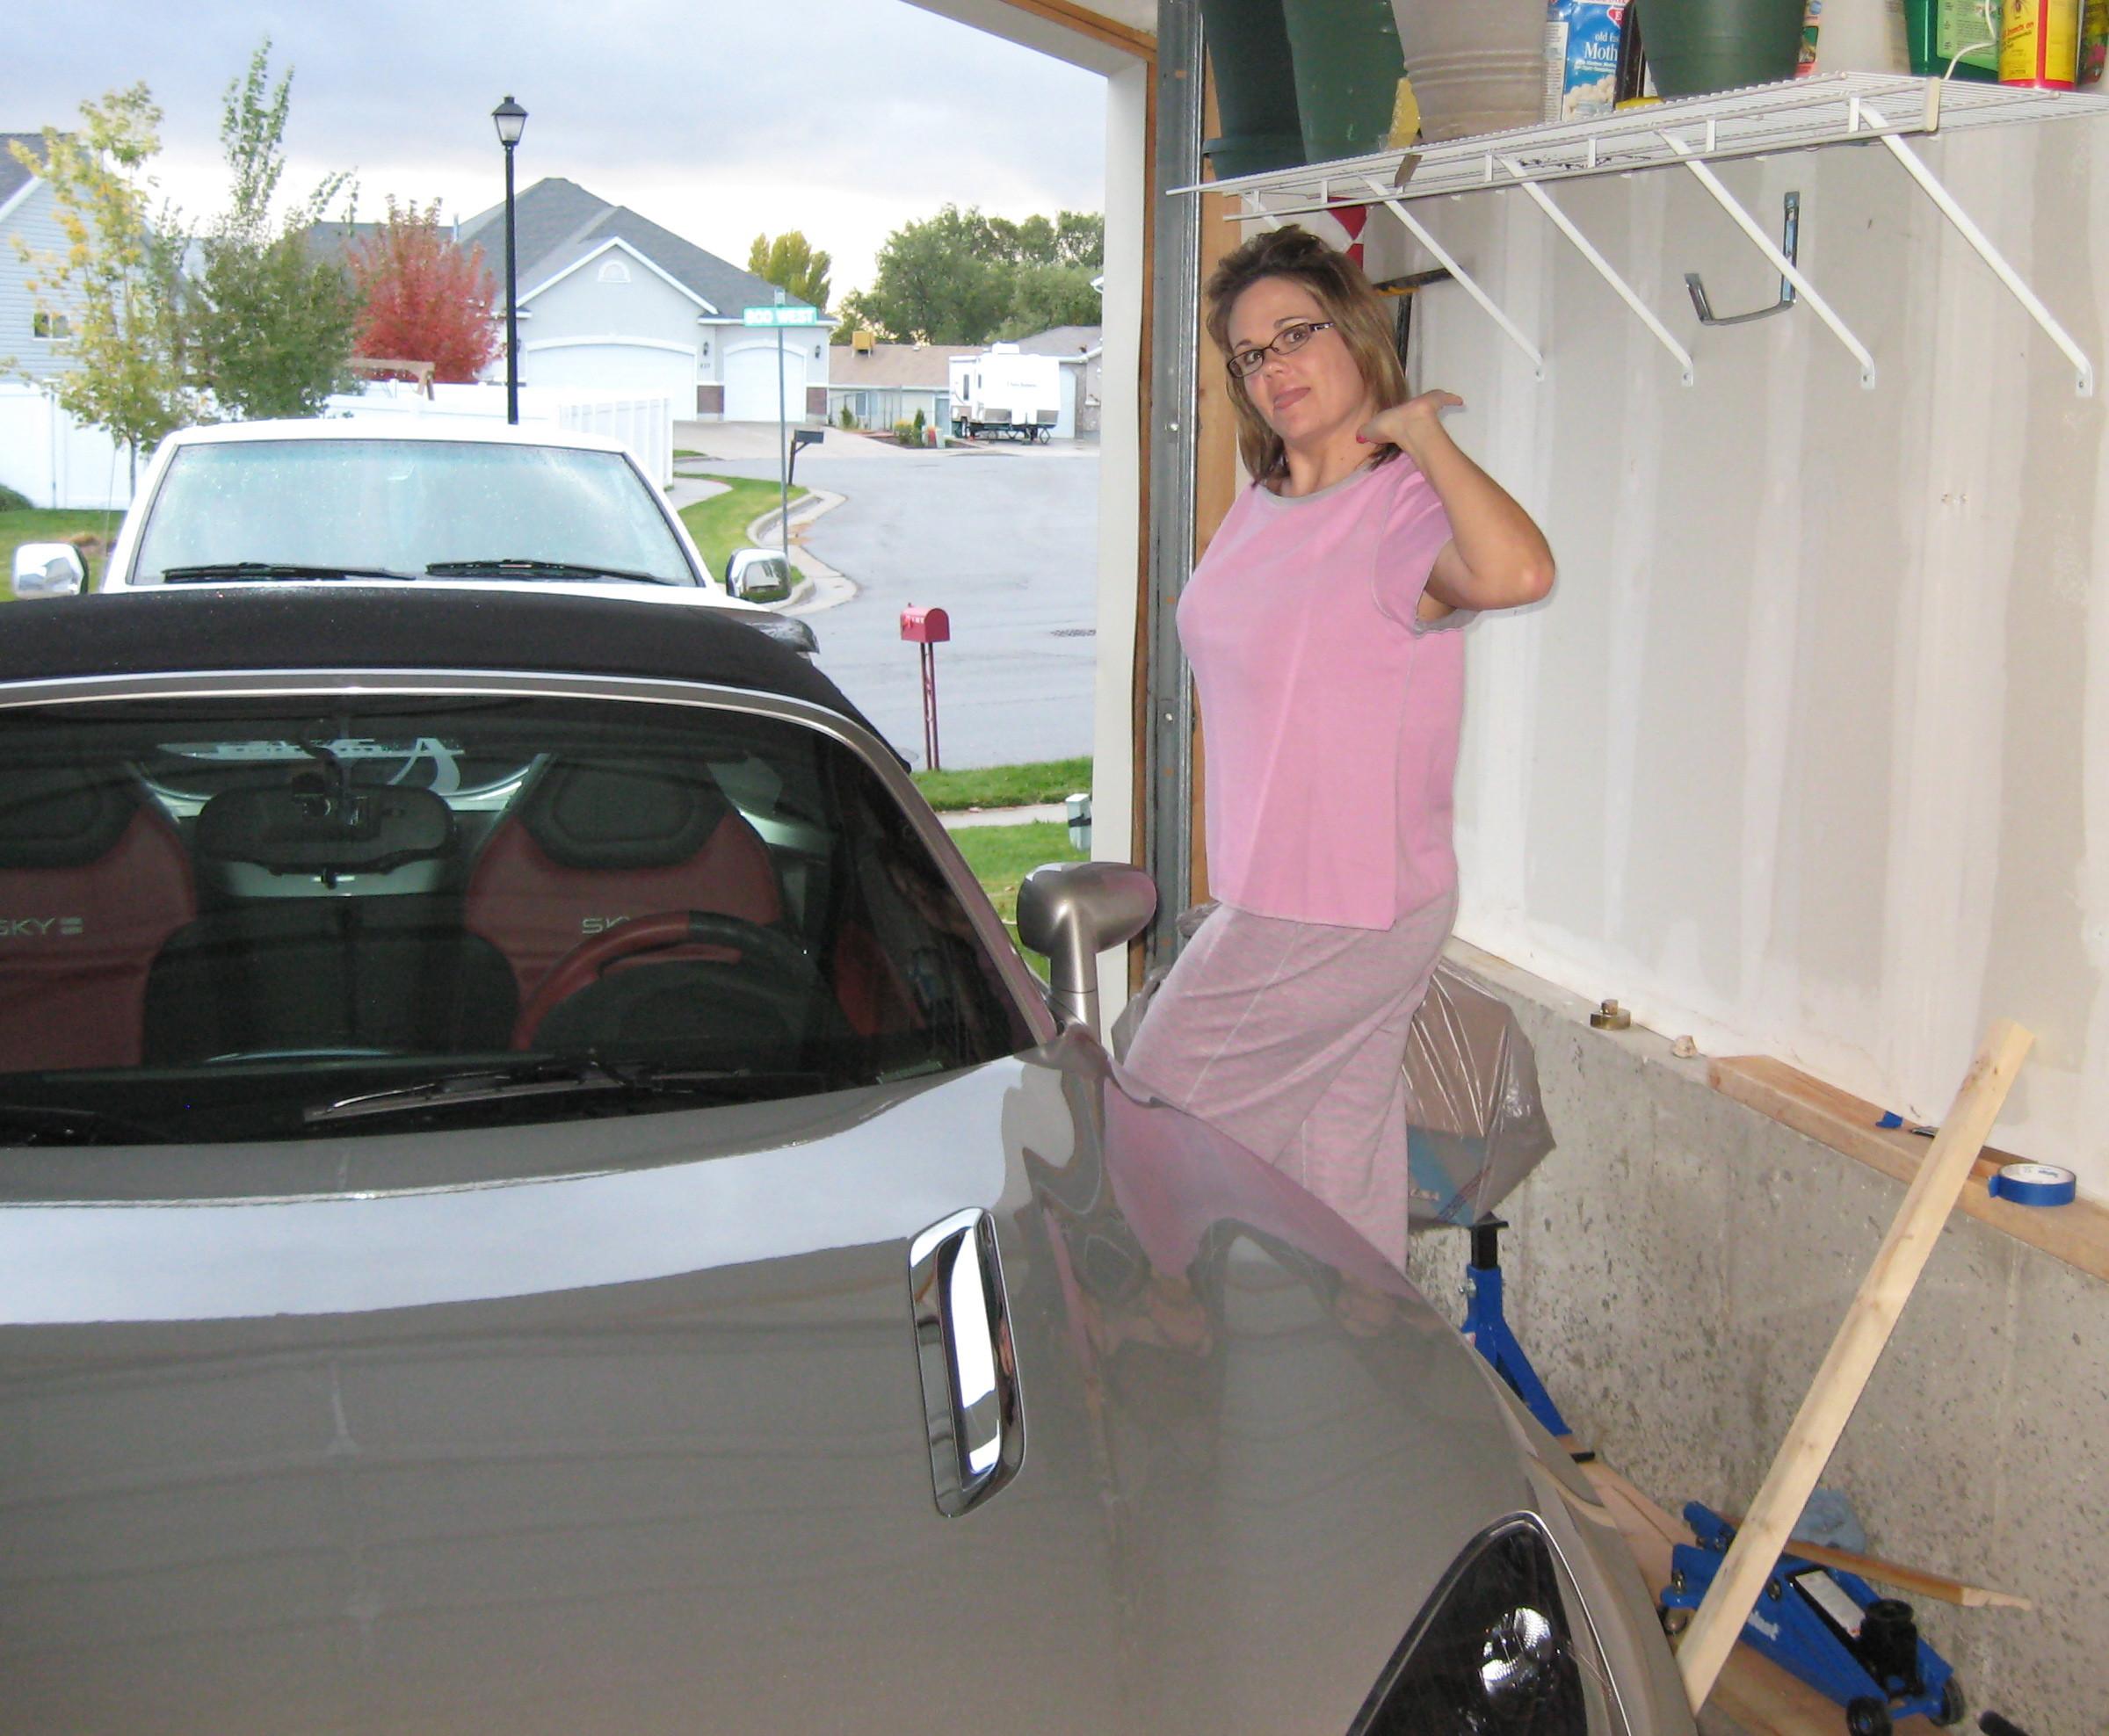 Opel Blitz Grill-wife.jpg